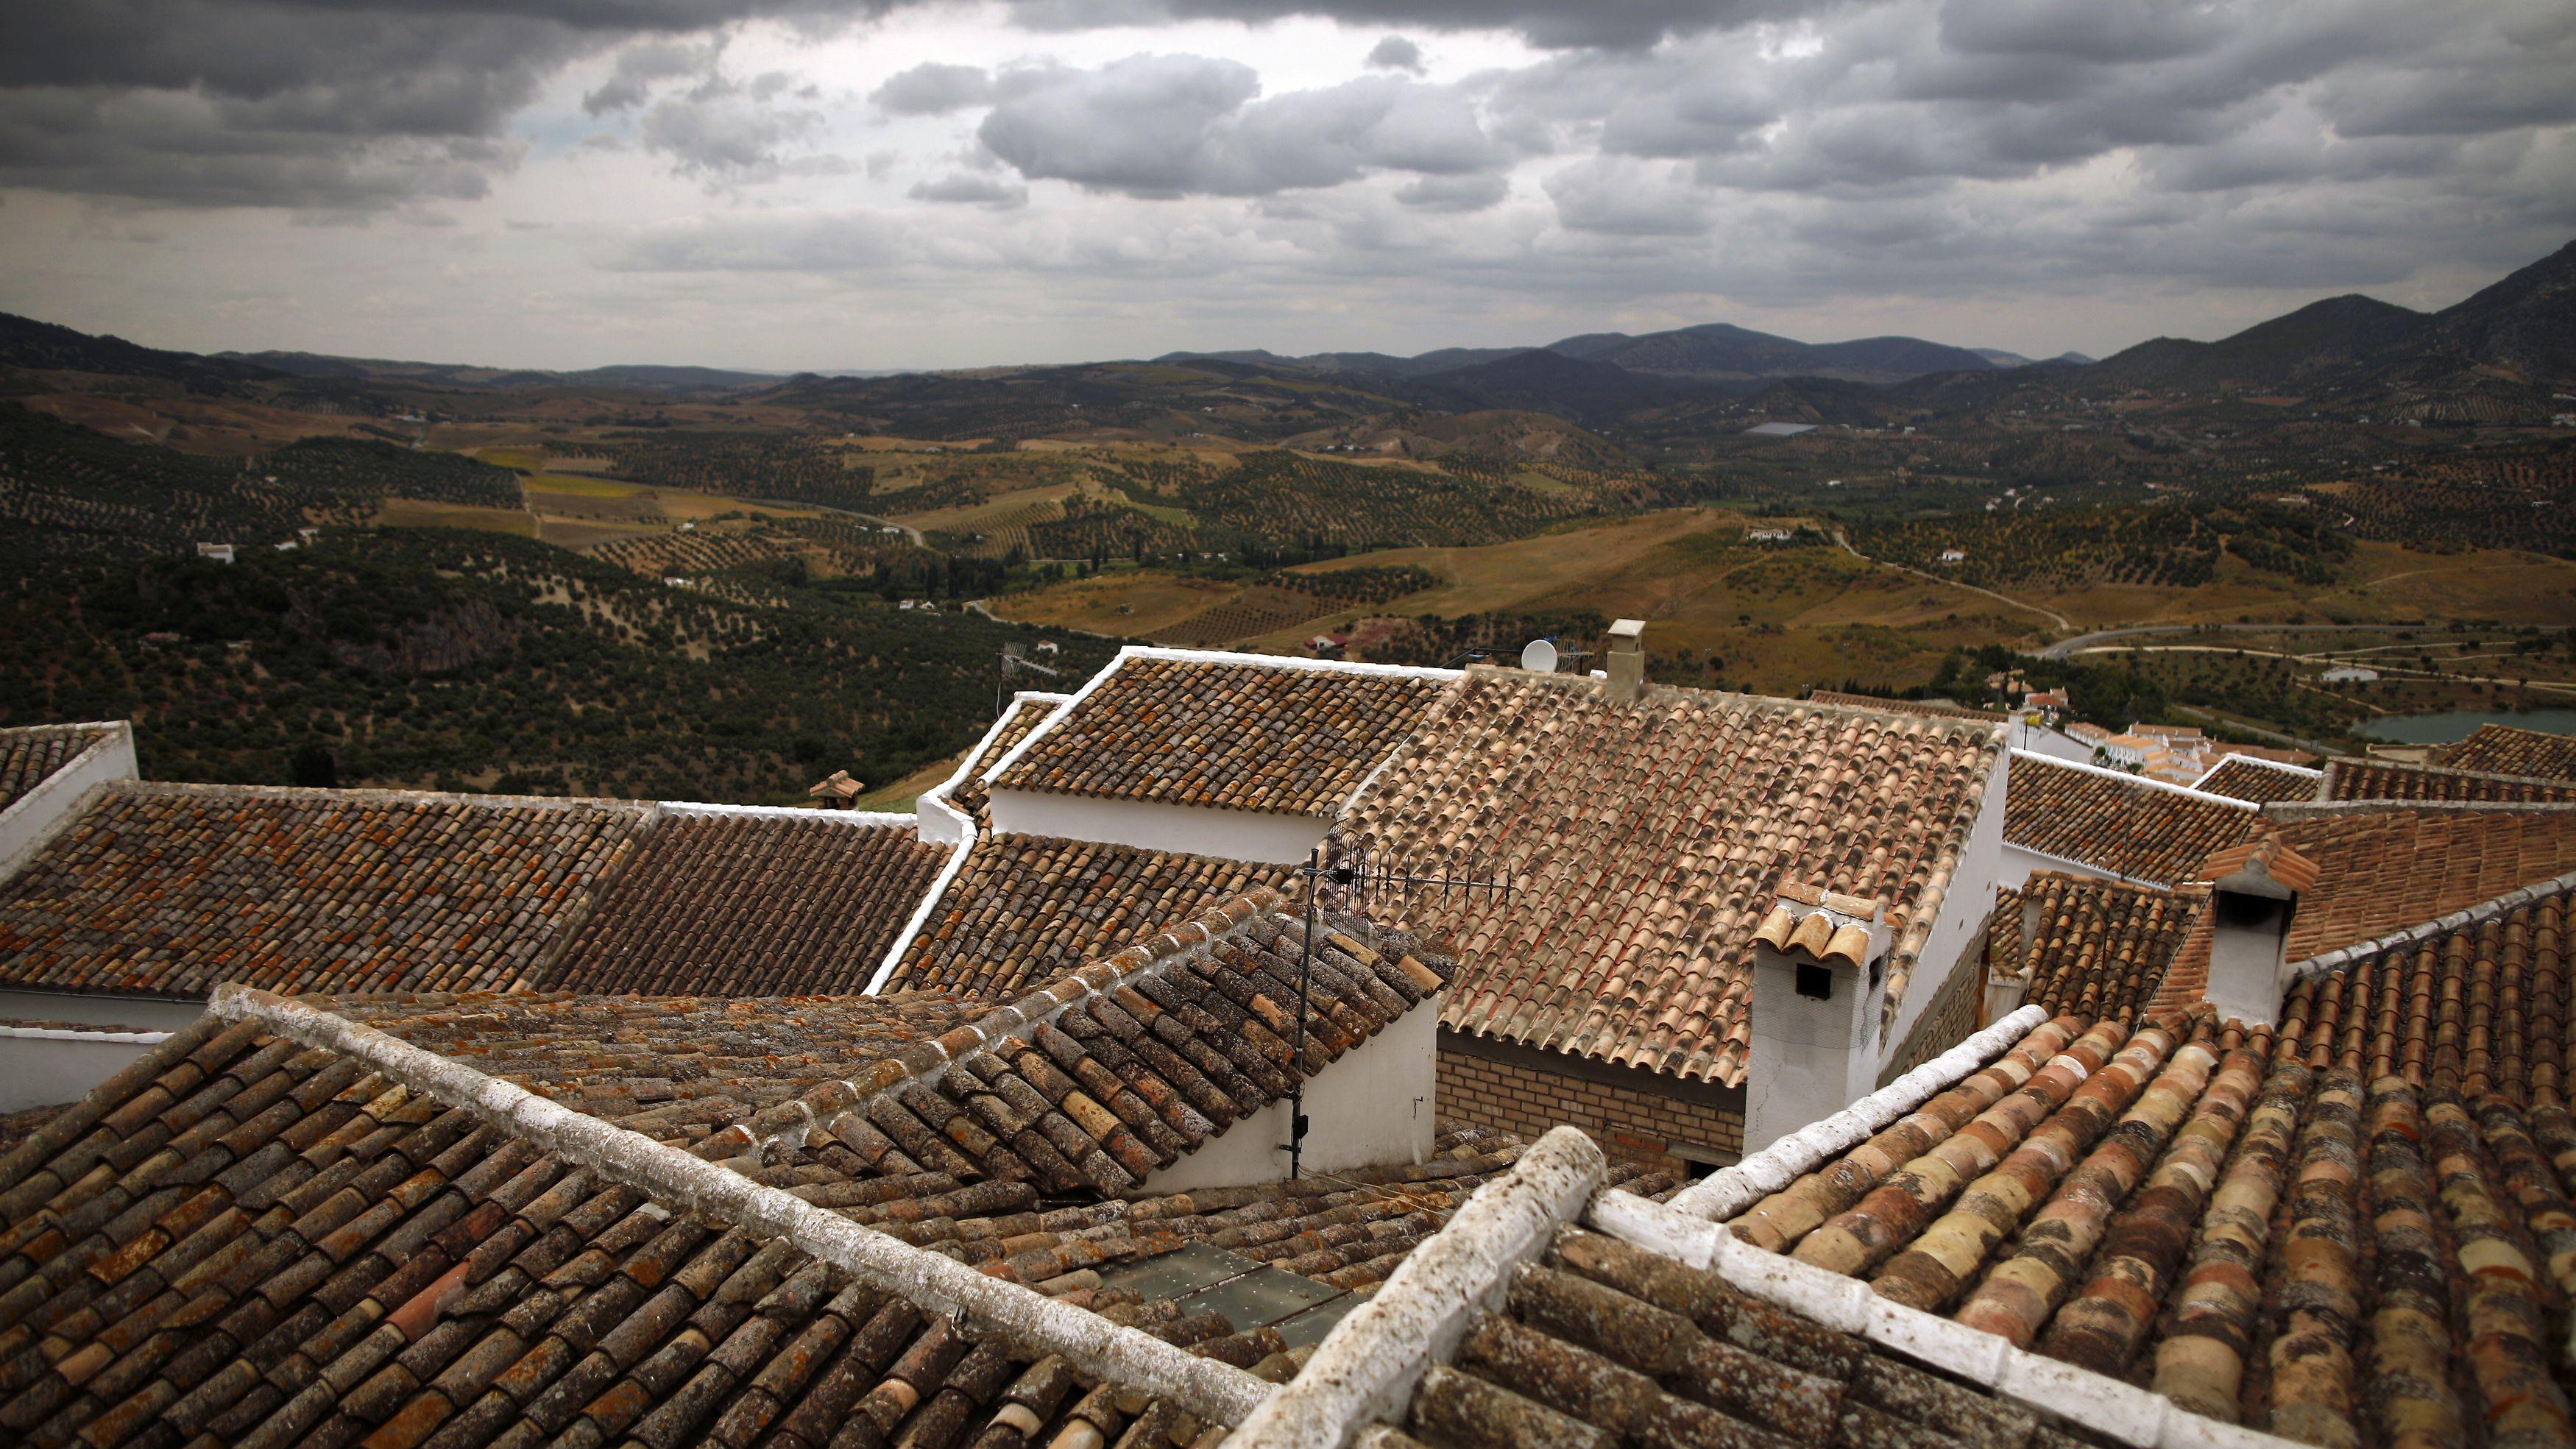 The tiled roofs of houses are seen in Zahara de la Sierra, southern Spain June 22, 2014. REUTERS/Jon Nazca